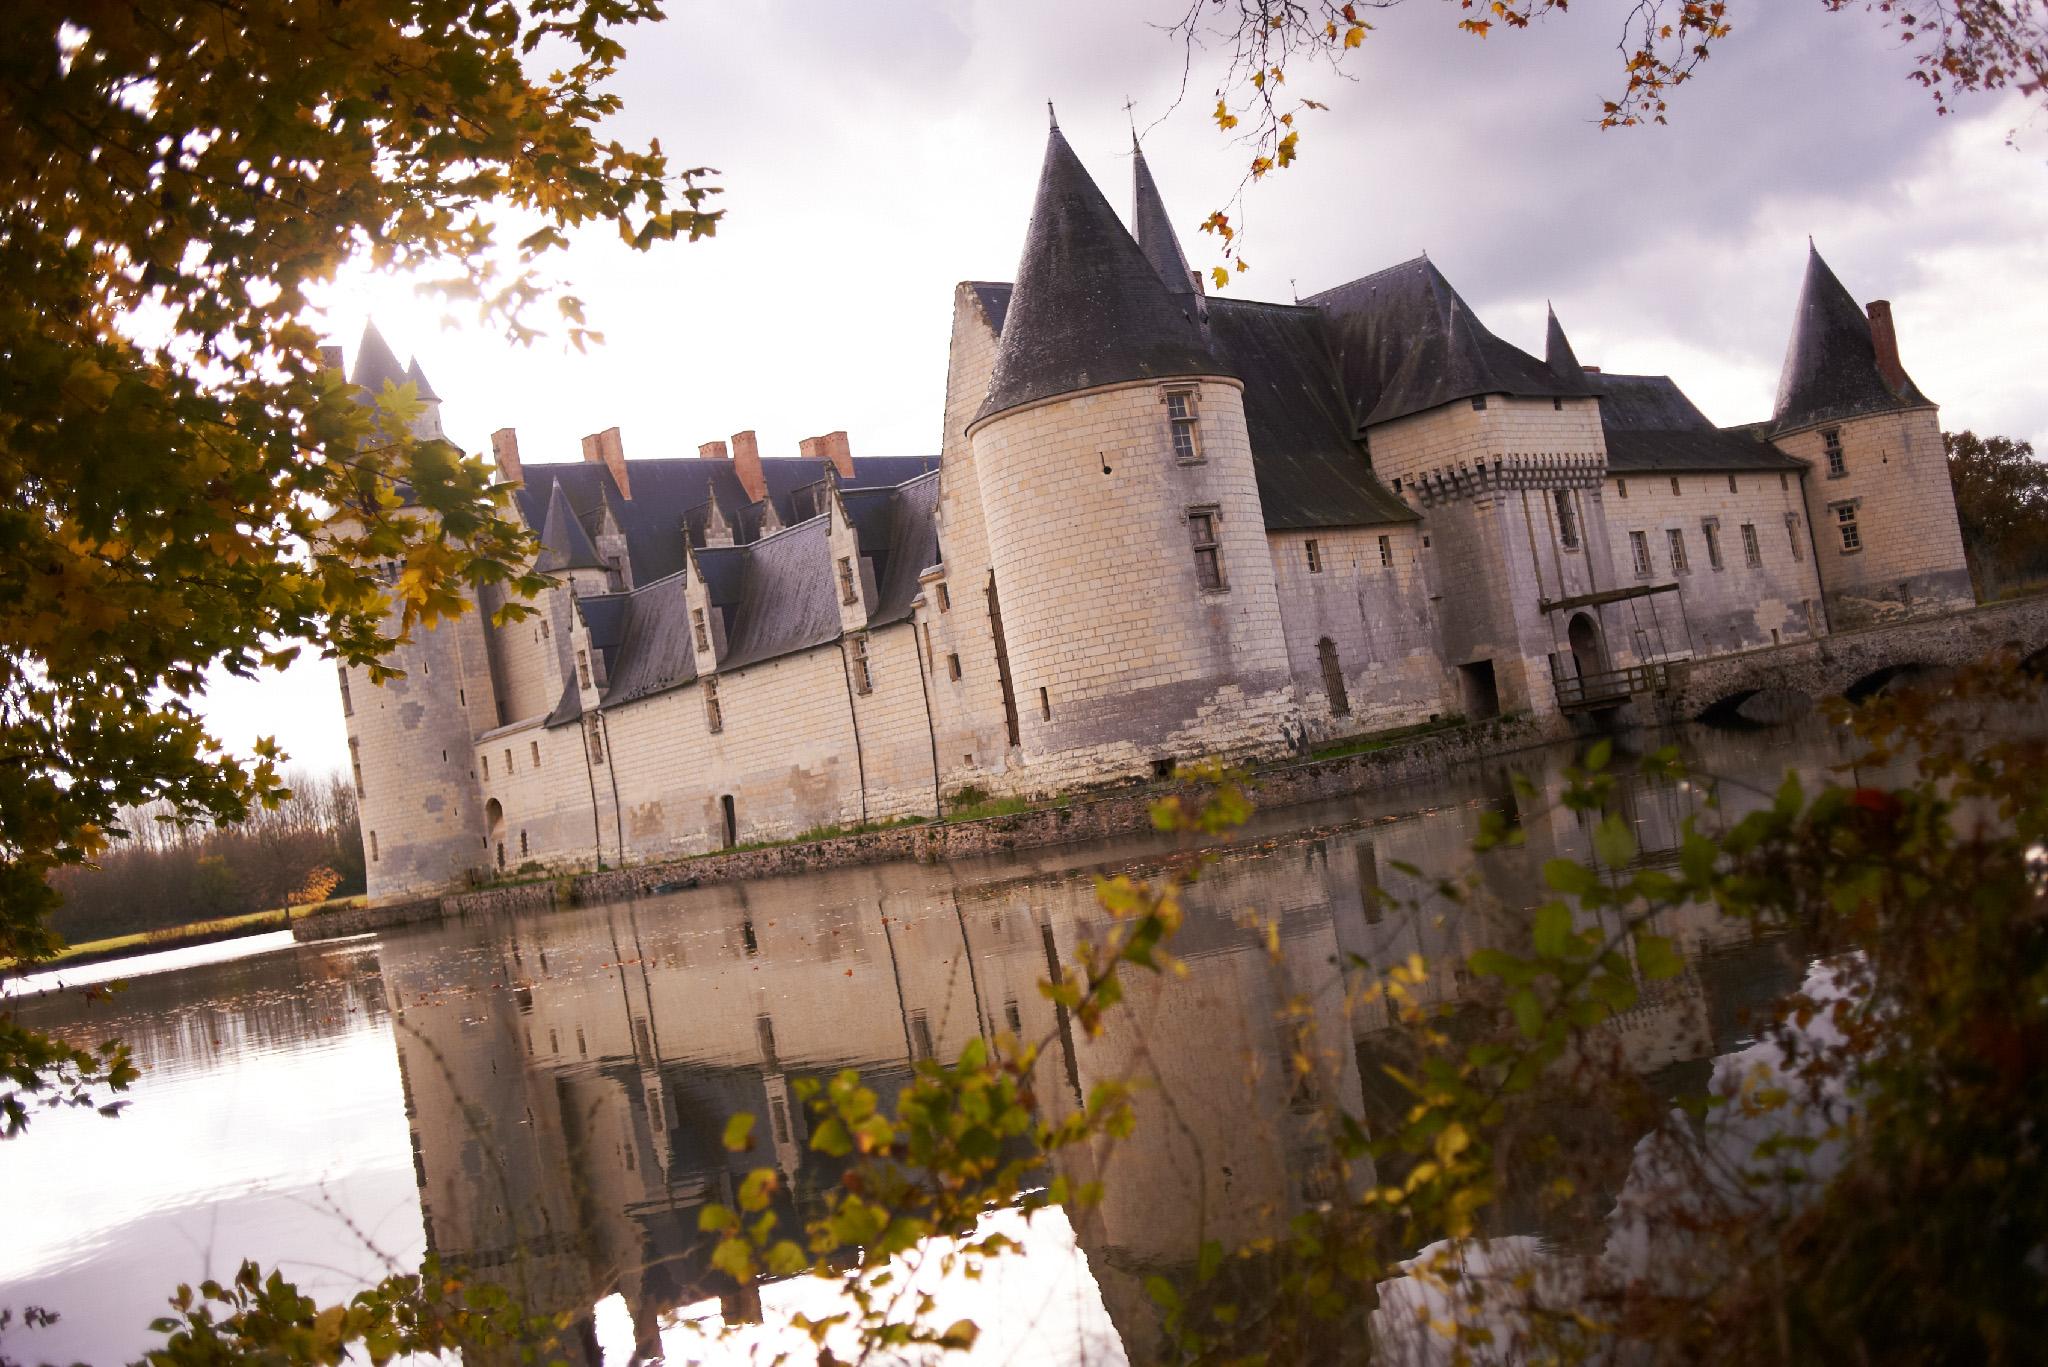 44_photographie_tourisme_patrimoine_paysage_voyage_nantes